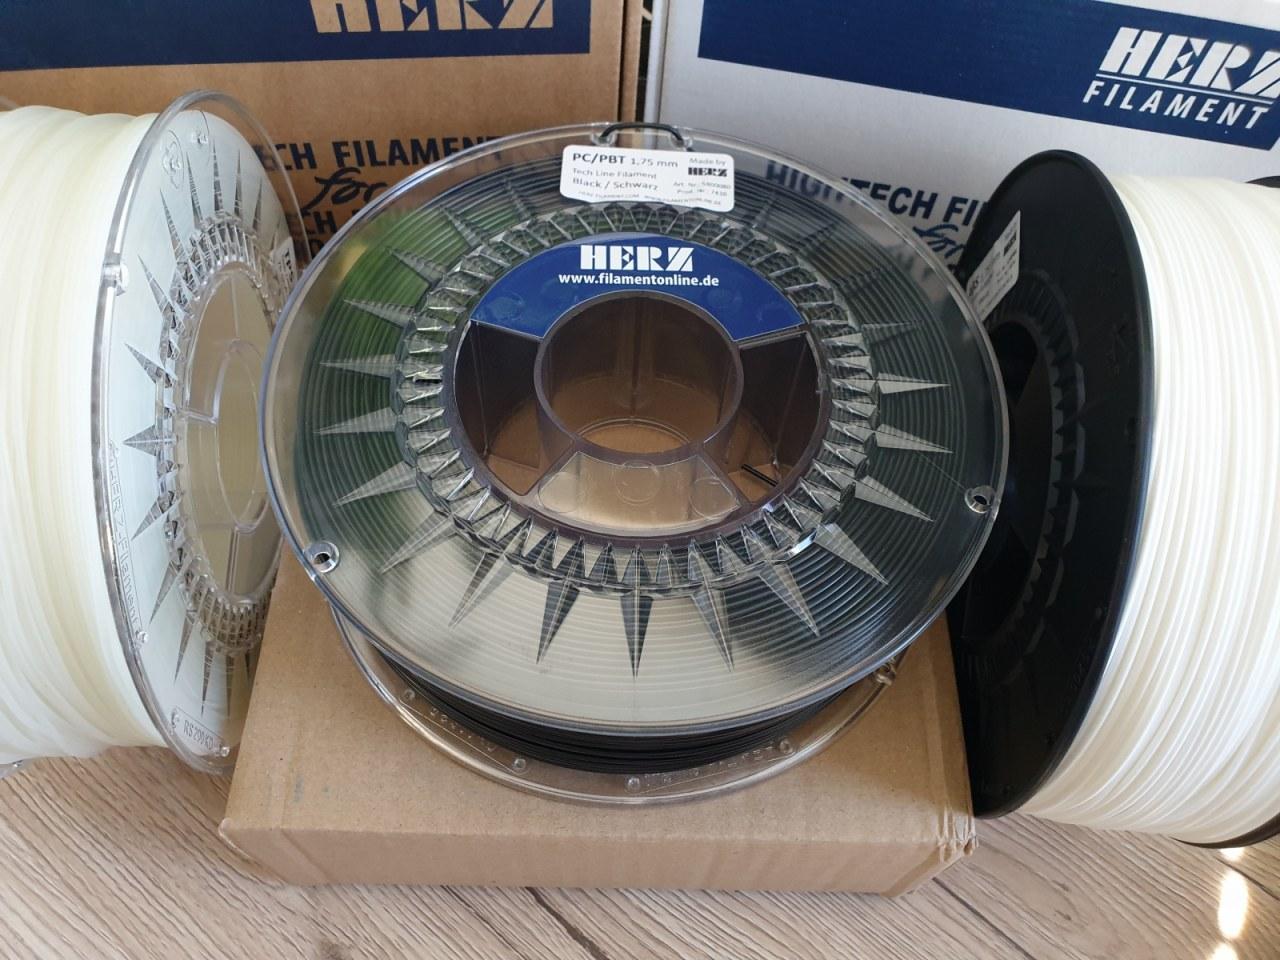 Herz_filament_1